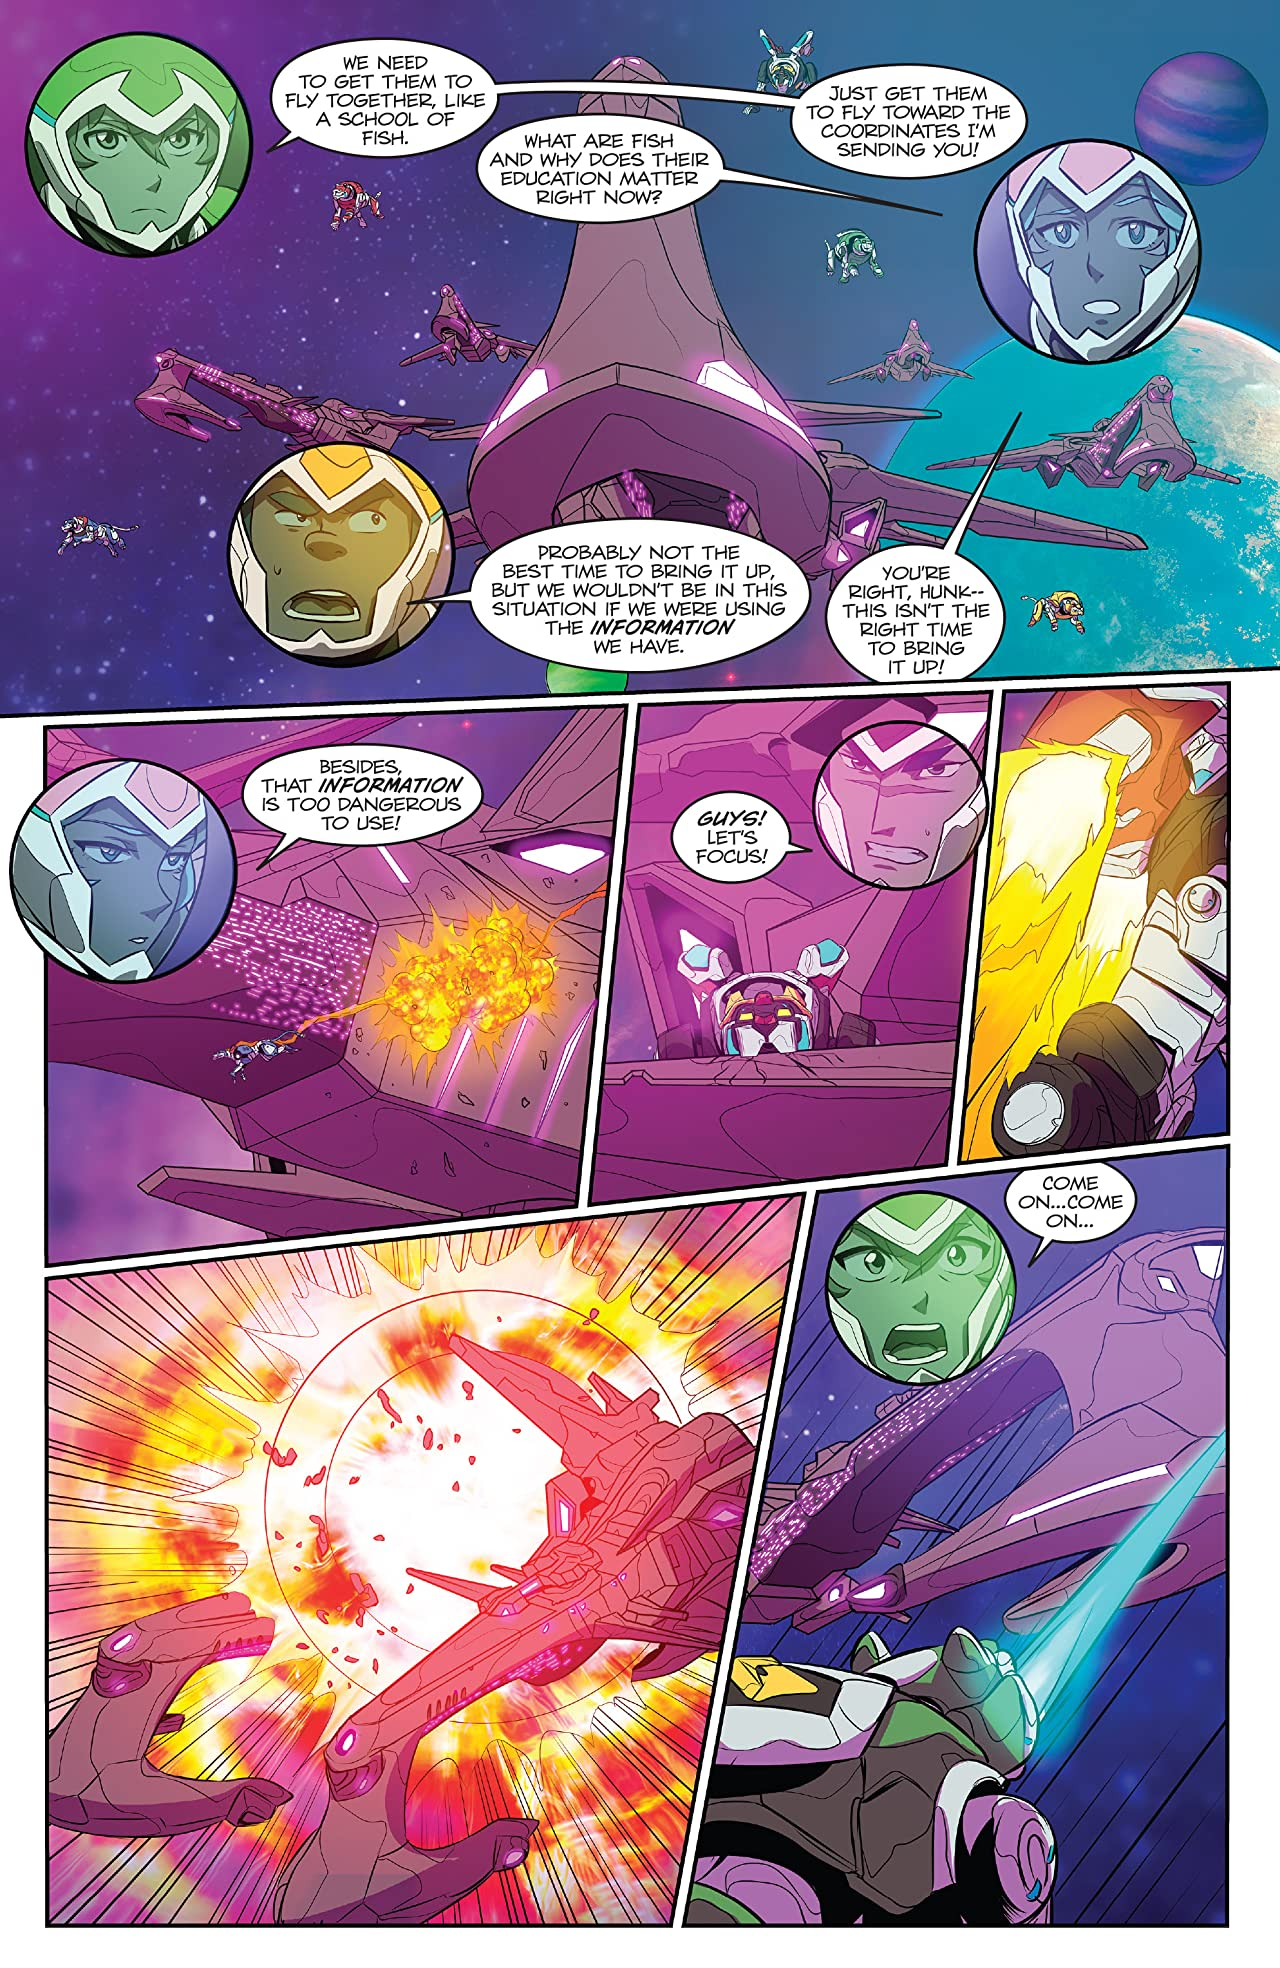 Voltron: Legendary Defender Vol. 3: Absolution